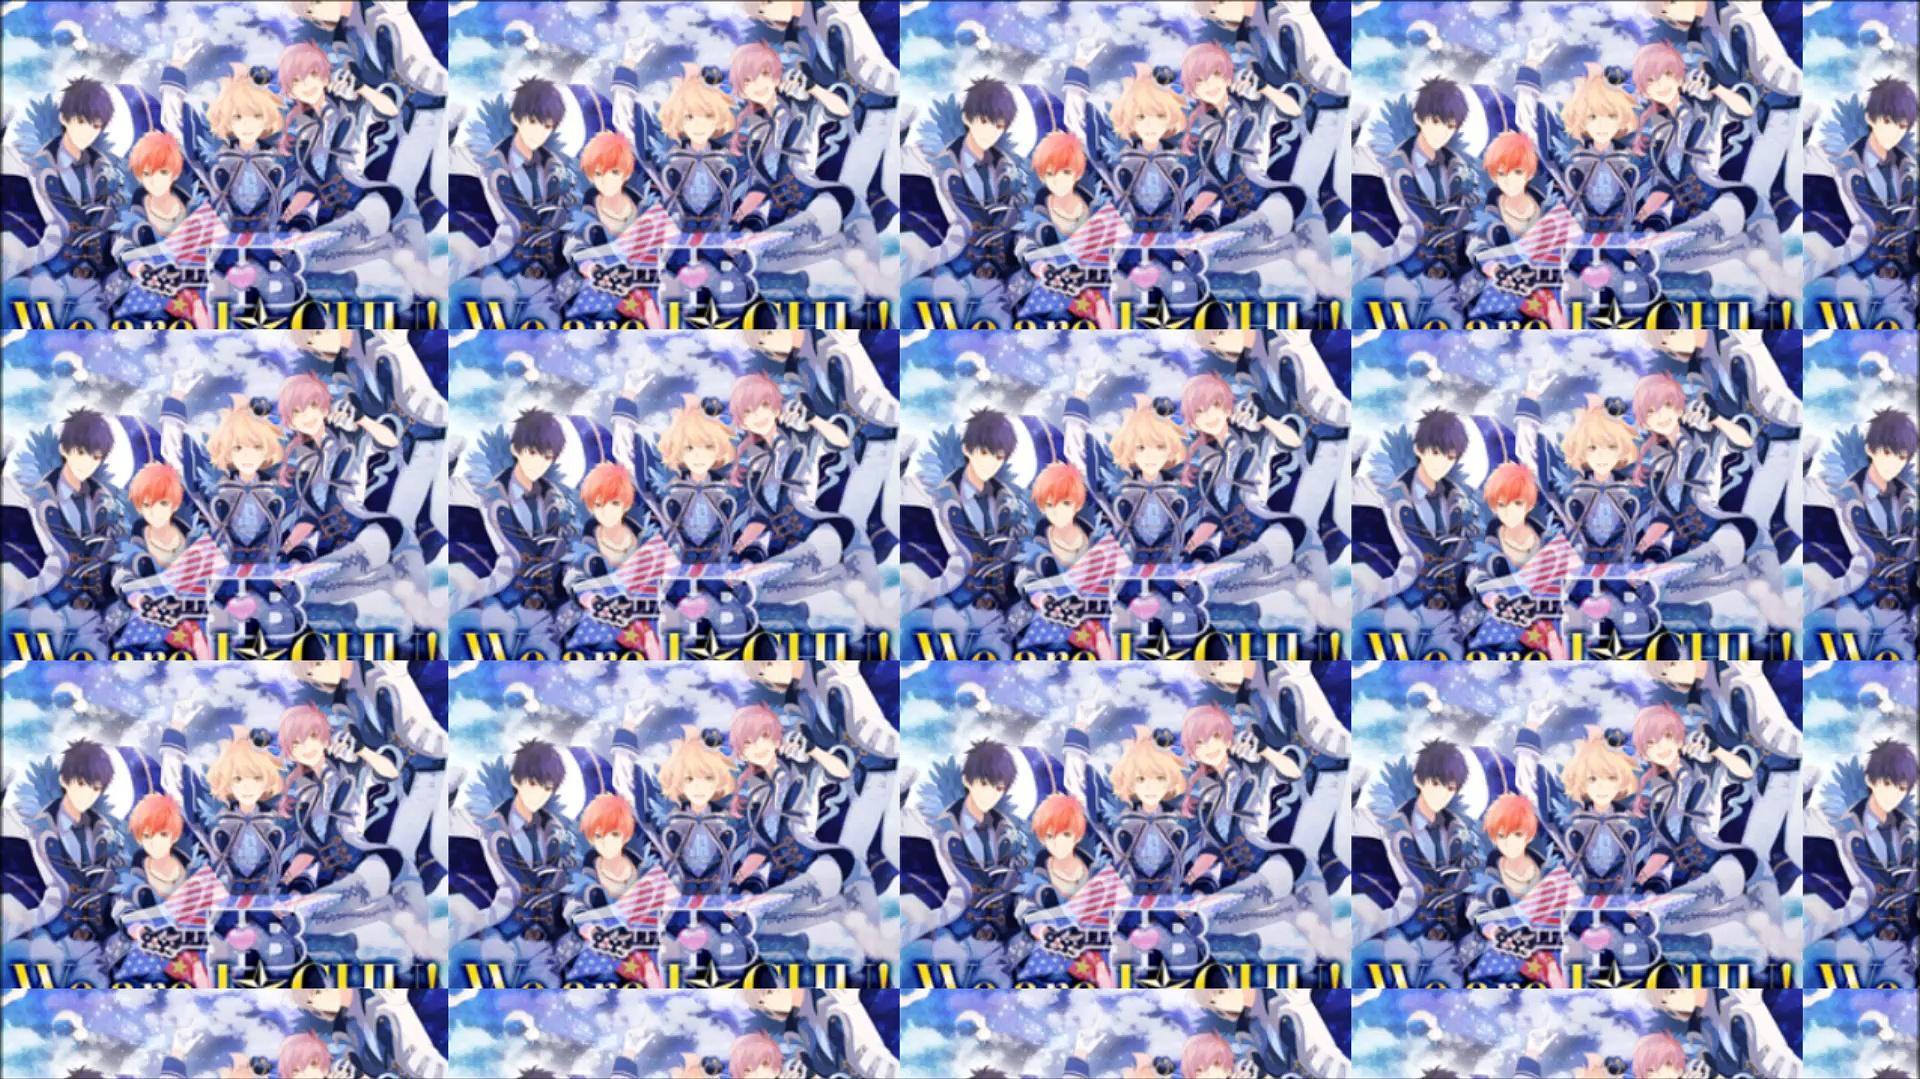 I♥B - We are I★CHU!